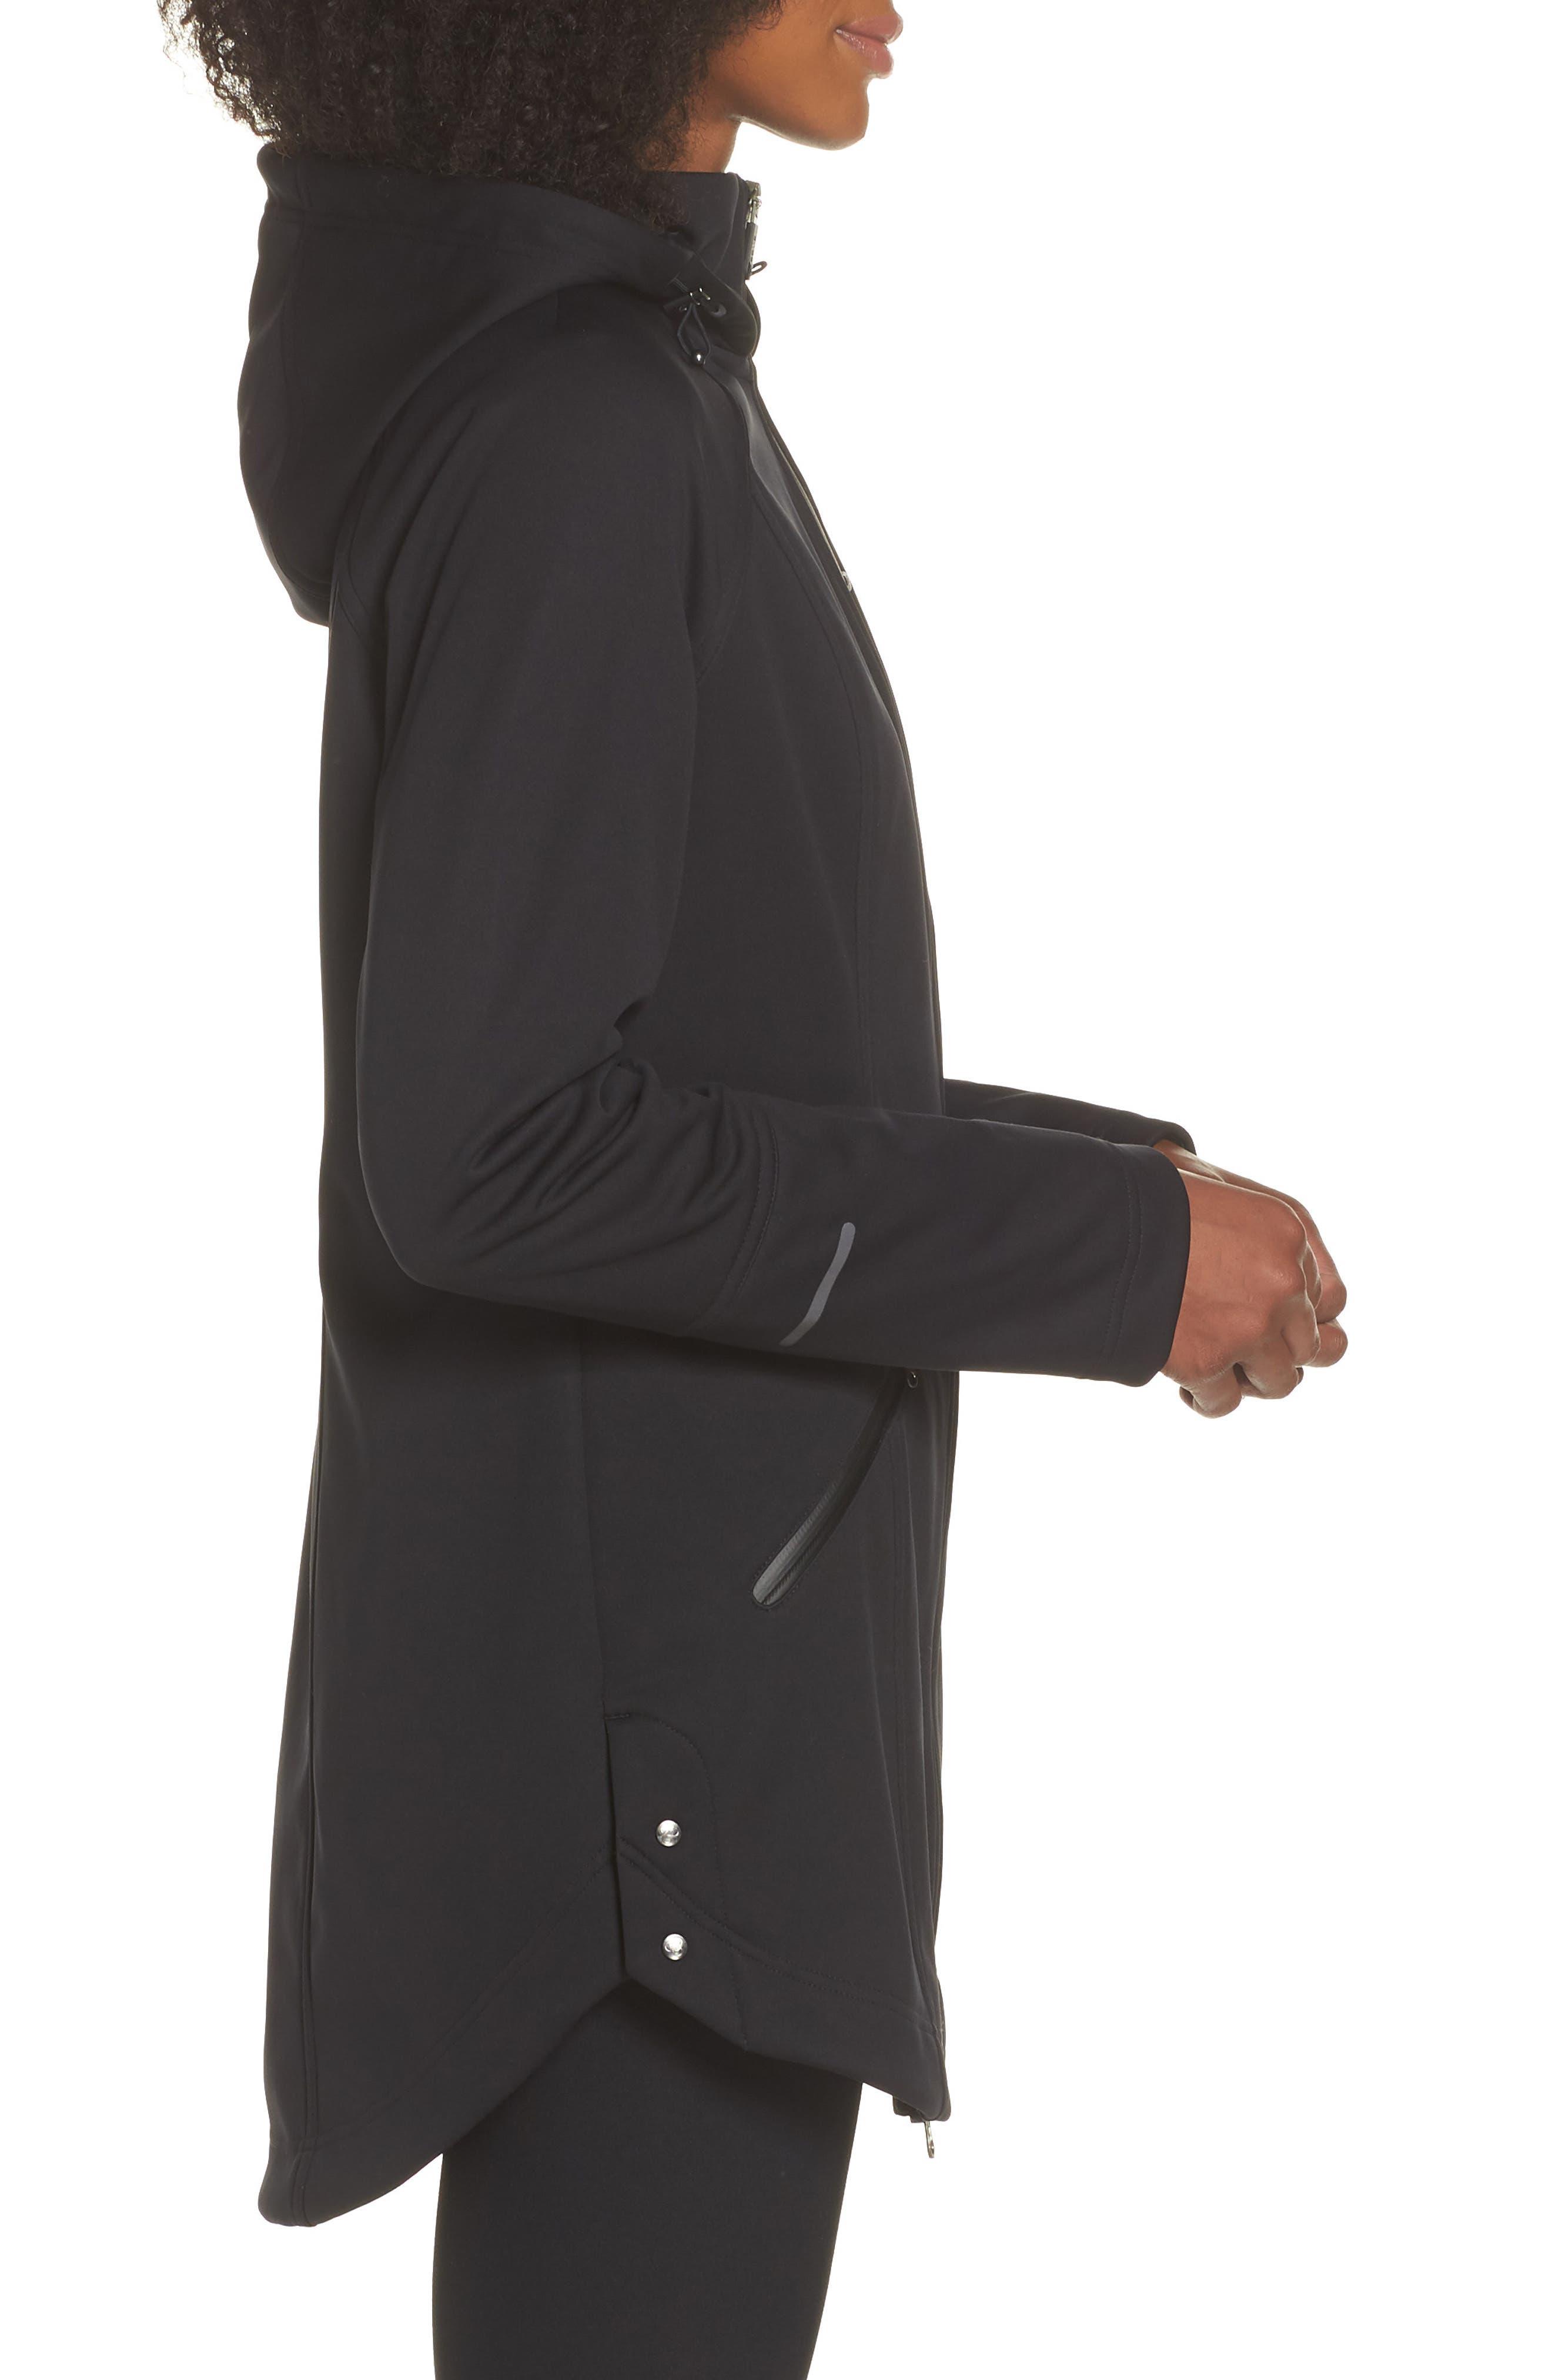 ZELLA, Aero Hooded Soft Shell Training Jacket, Alternate thumbnail 4, color, 001